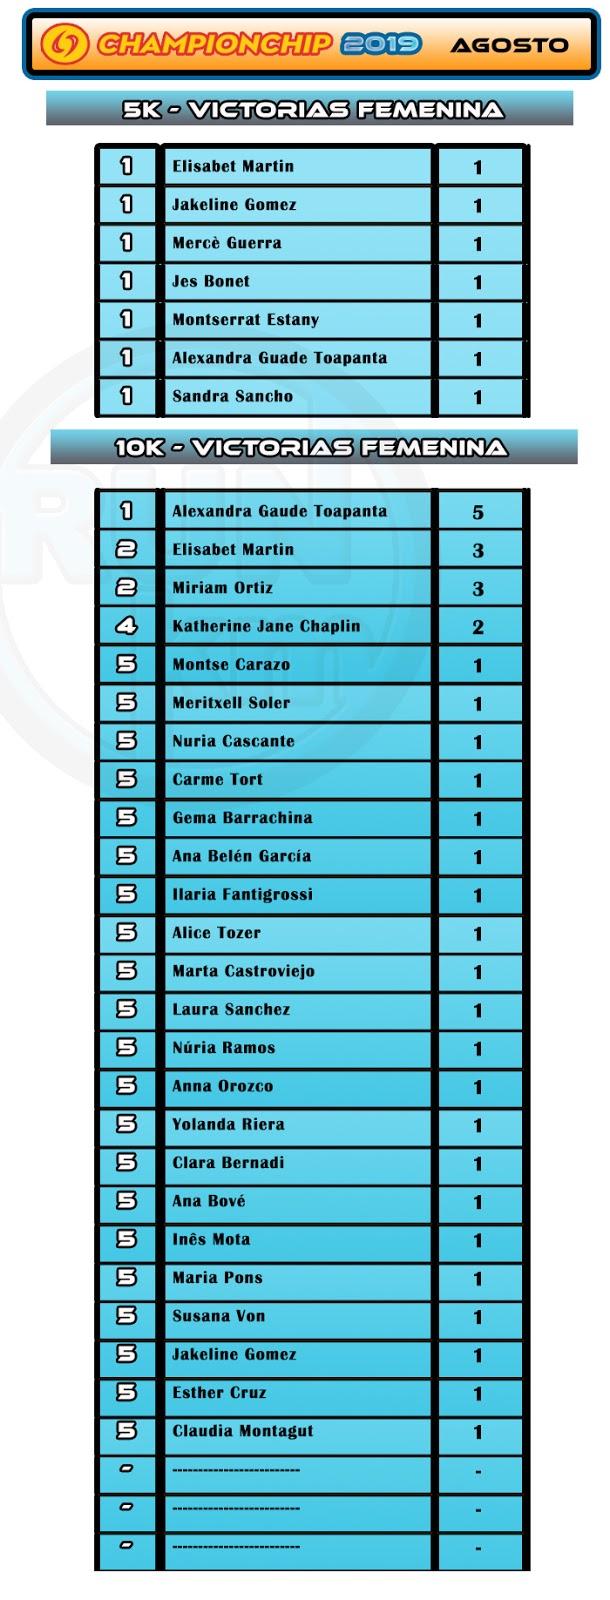 Lliga Championchip 2019 - Agosto - Ranking Victorias Femenina